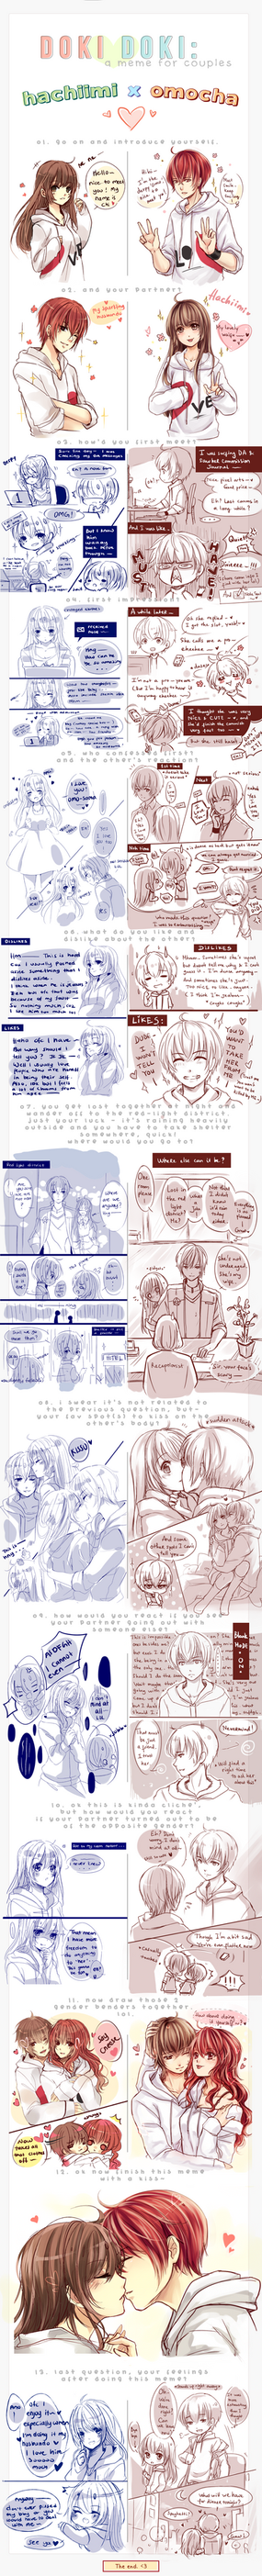 [Doki Doki Meme] Me X my husbandoooo by Hachiimi